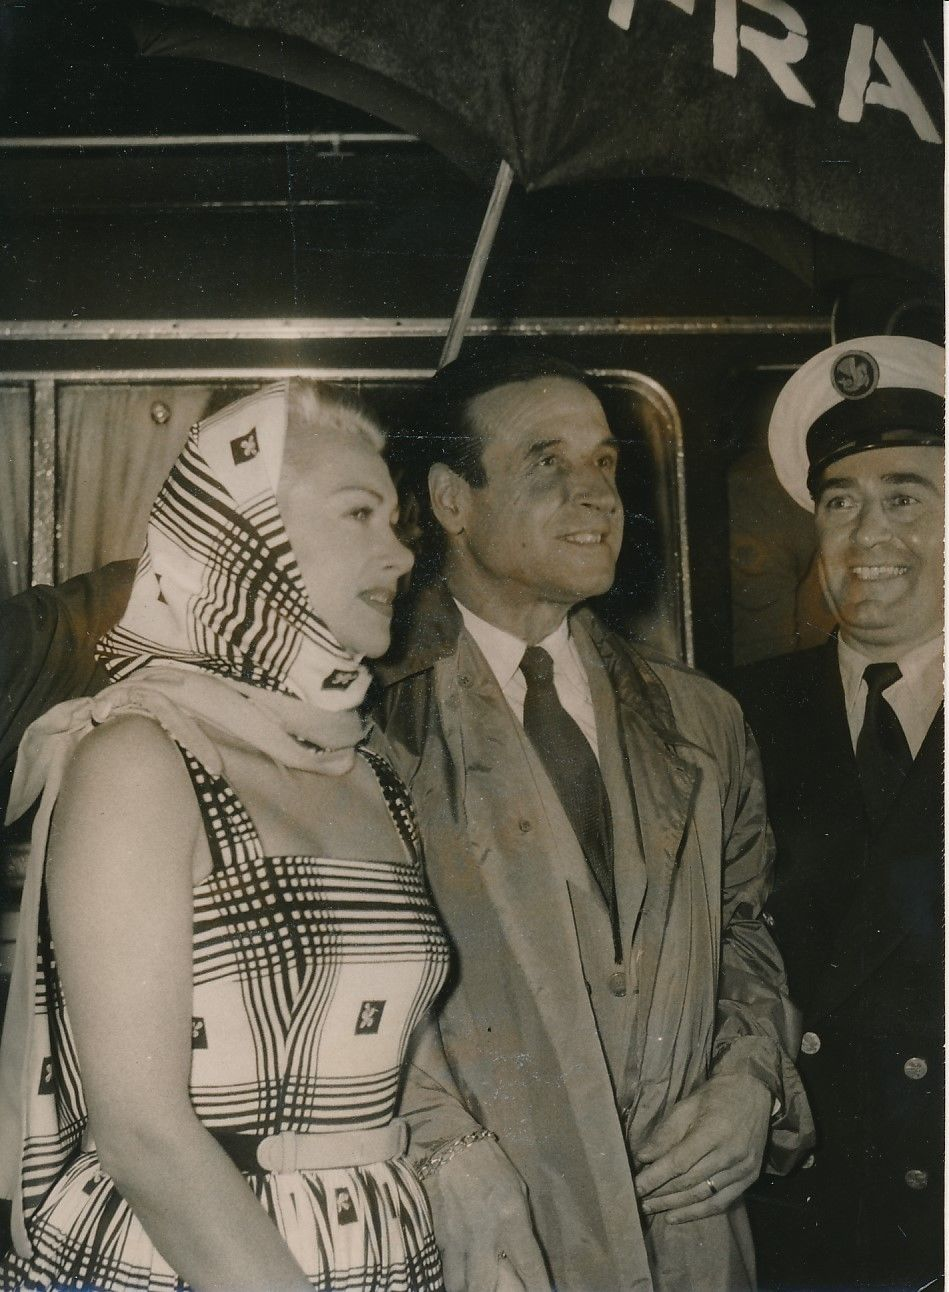 Martine Carol - Christian Jacques - 1956